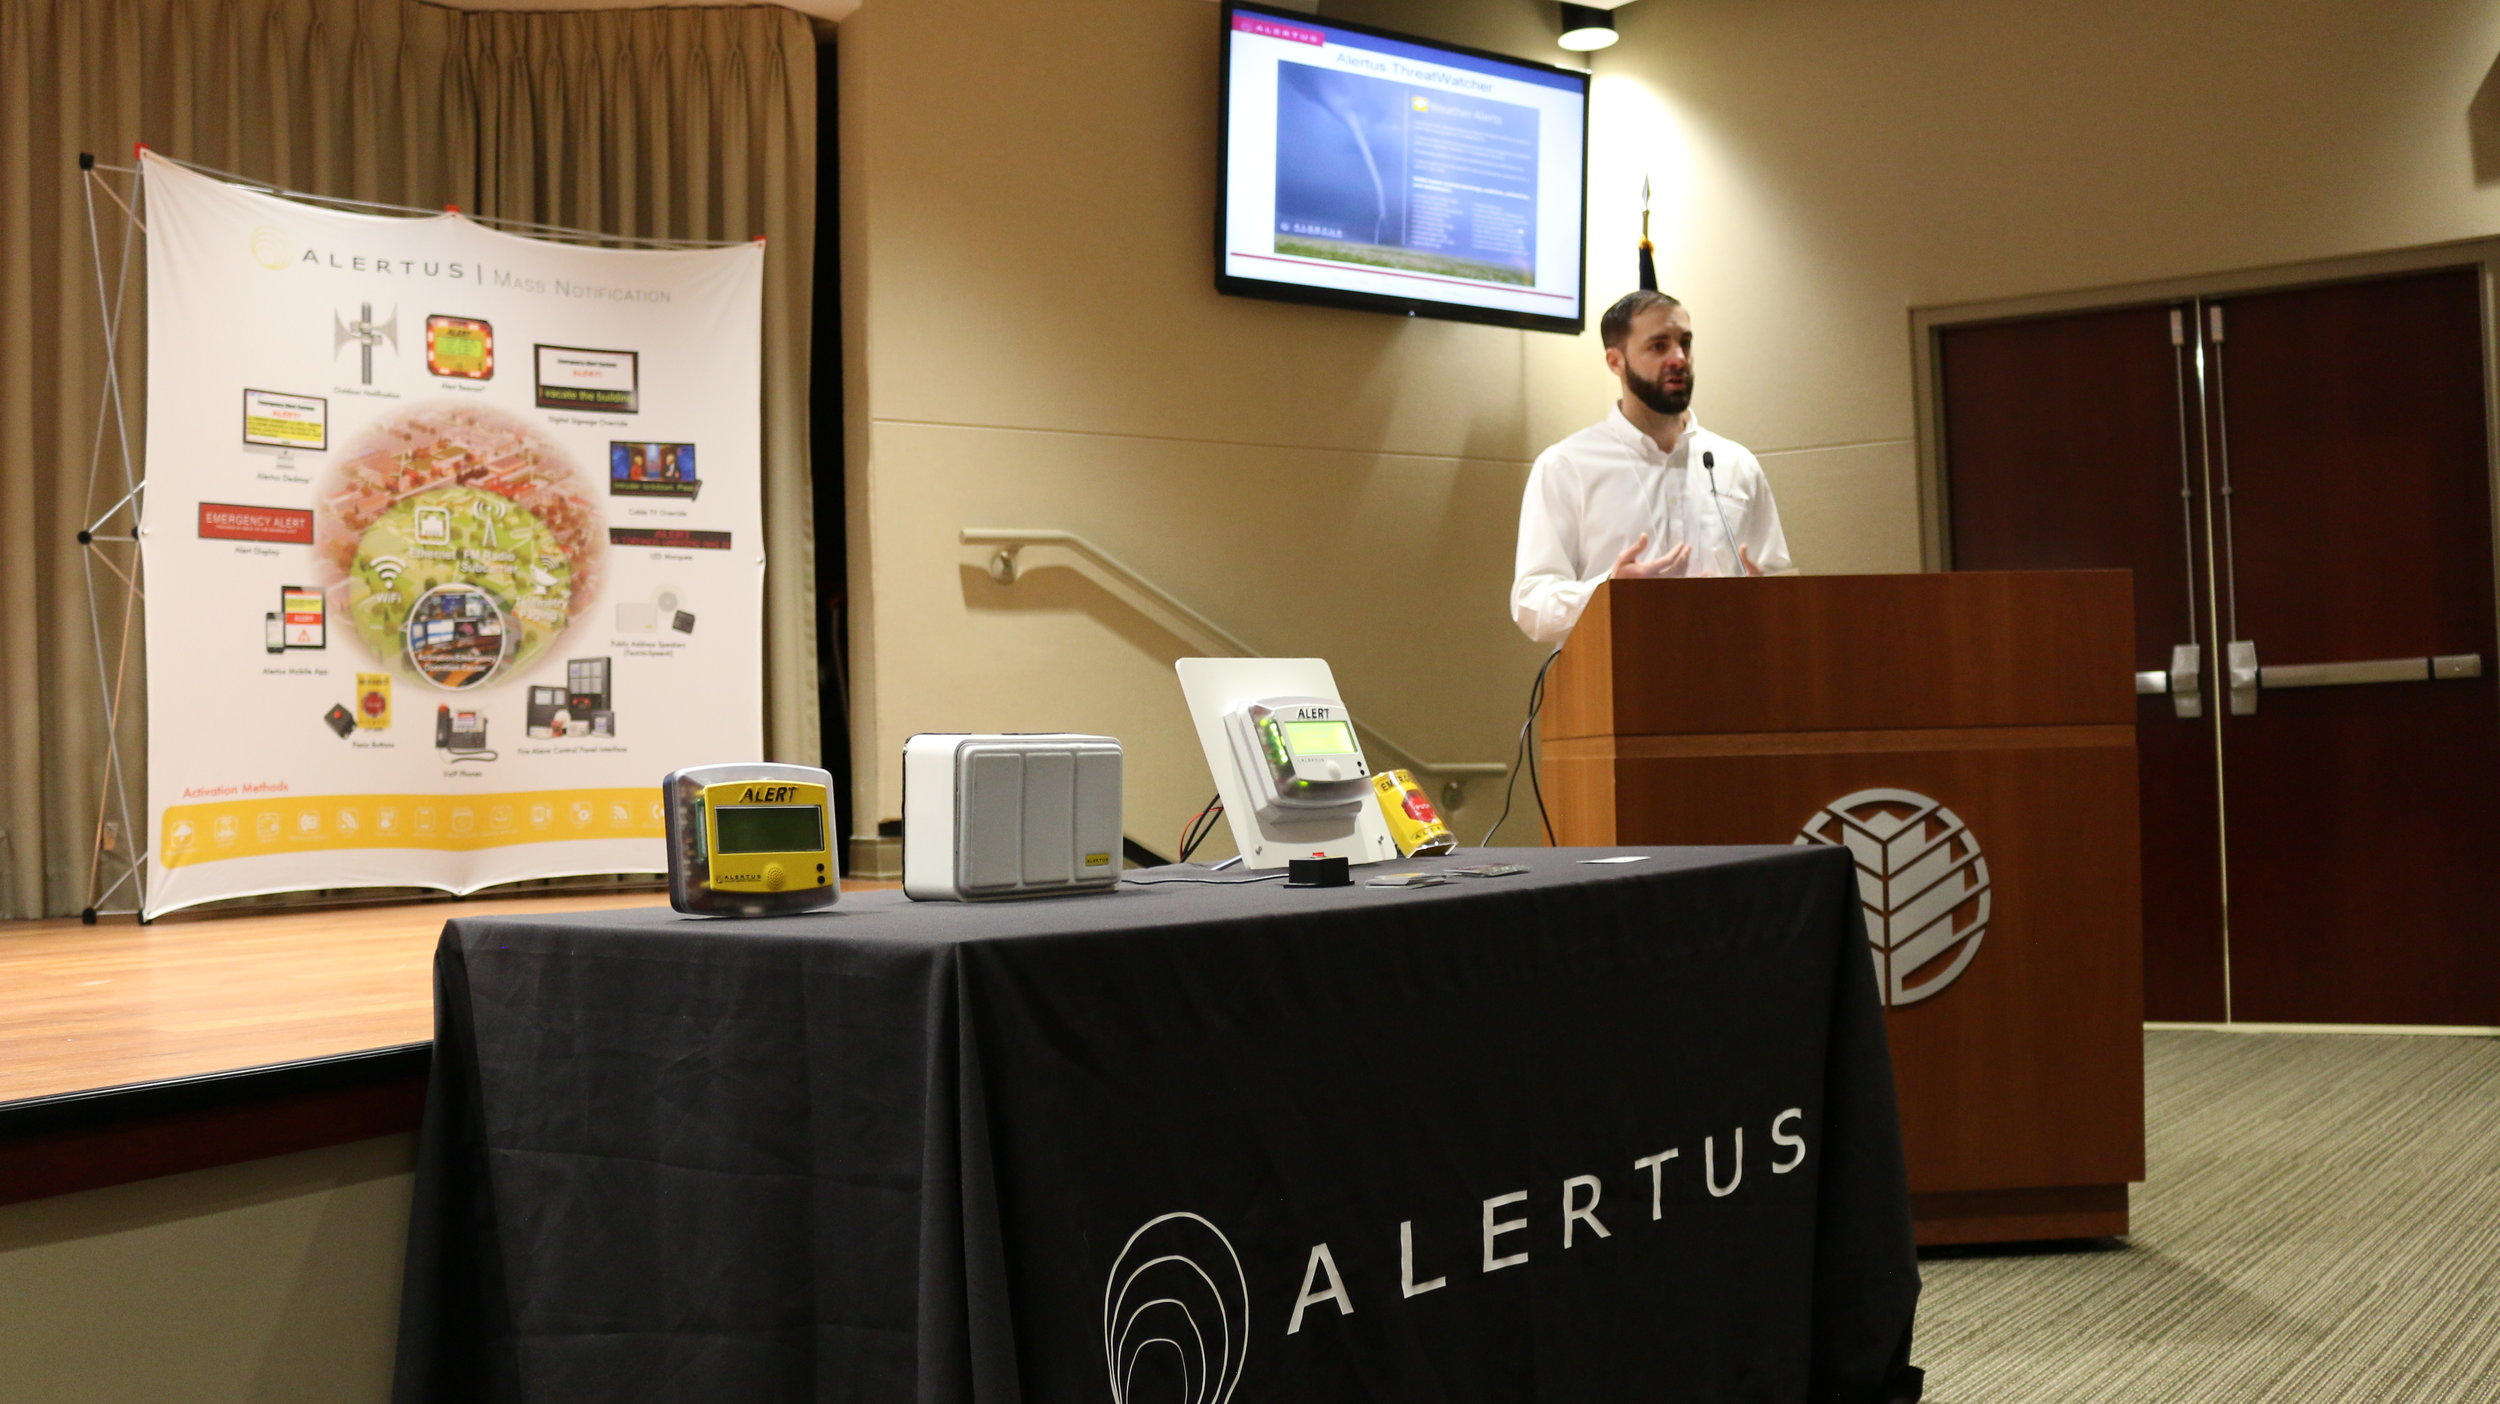 John Robling, Regional Sales Manager for Alertus Technologies